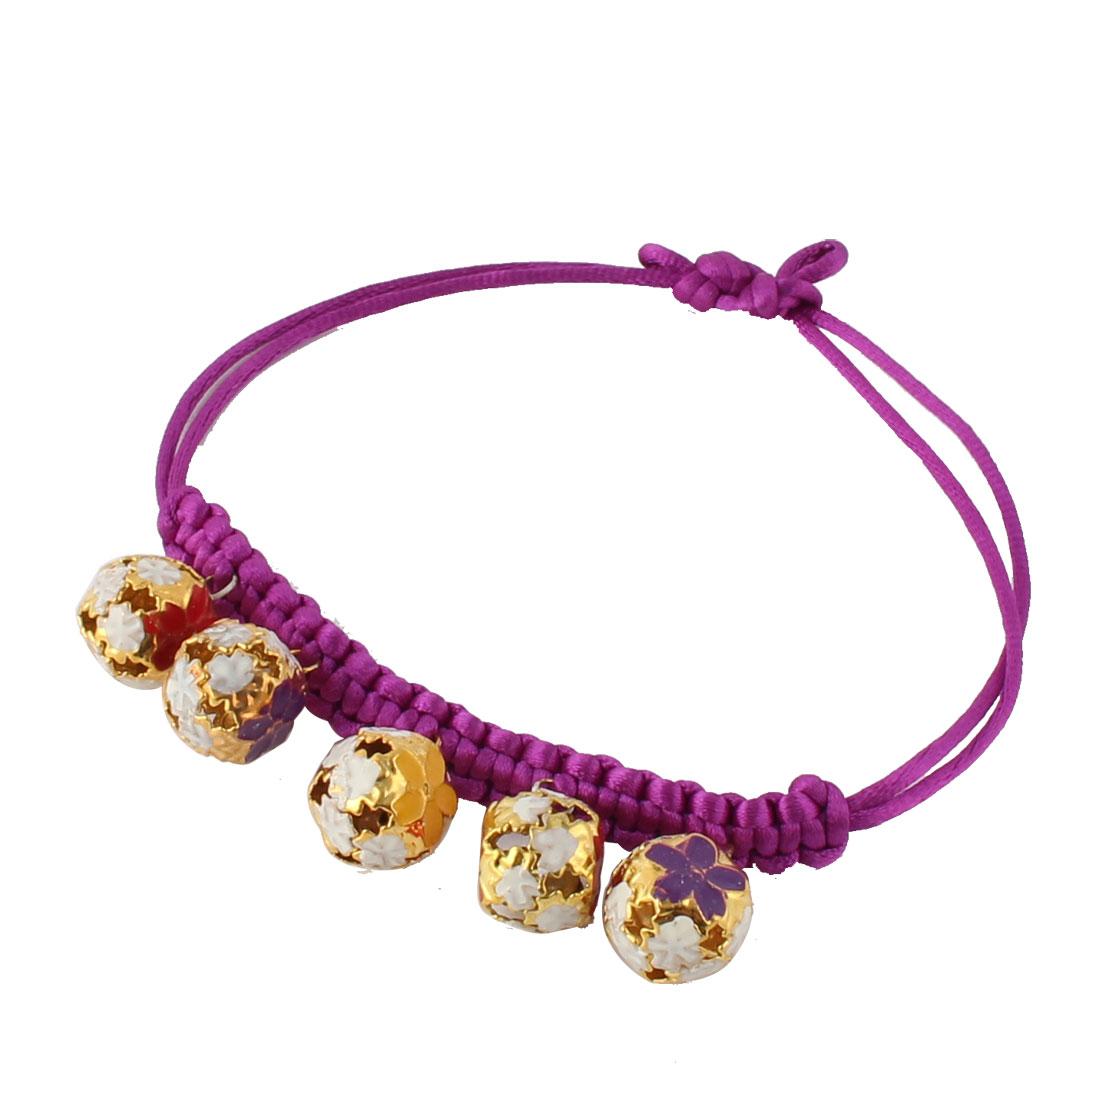 Pet Dog Nylon Braided Rope Strap Flower Pattern Bell Pendant Decor Adjustable Belt Necklace Collar Bracelet